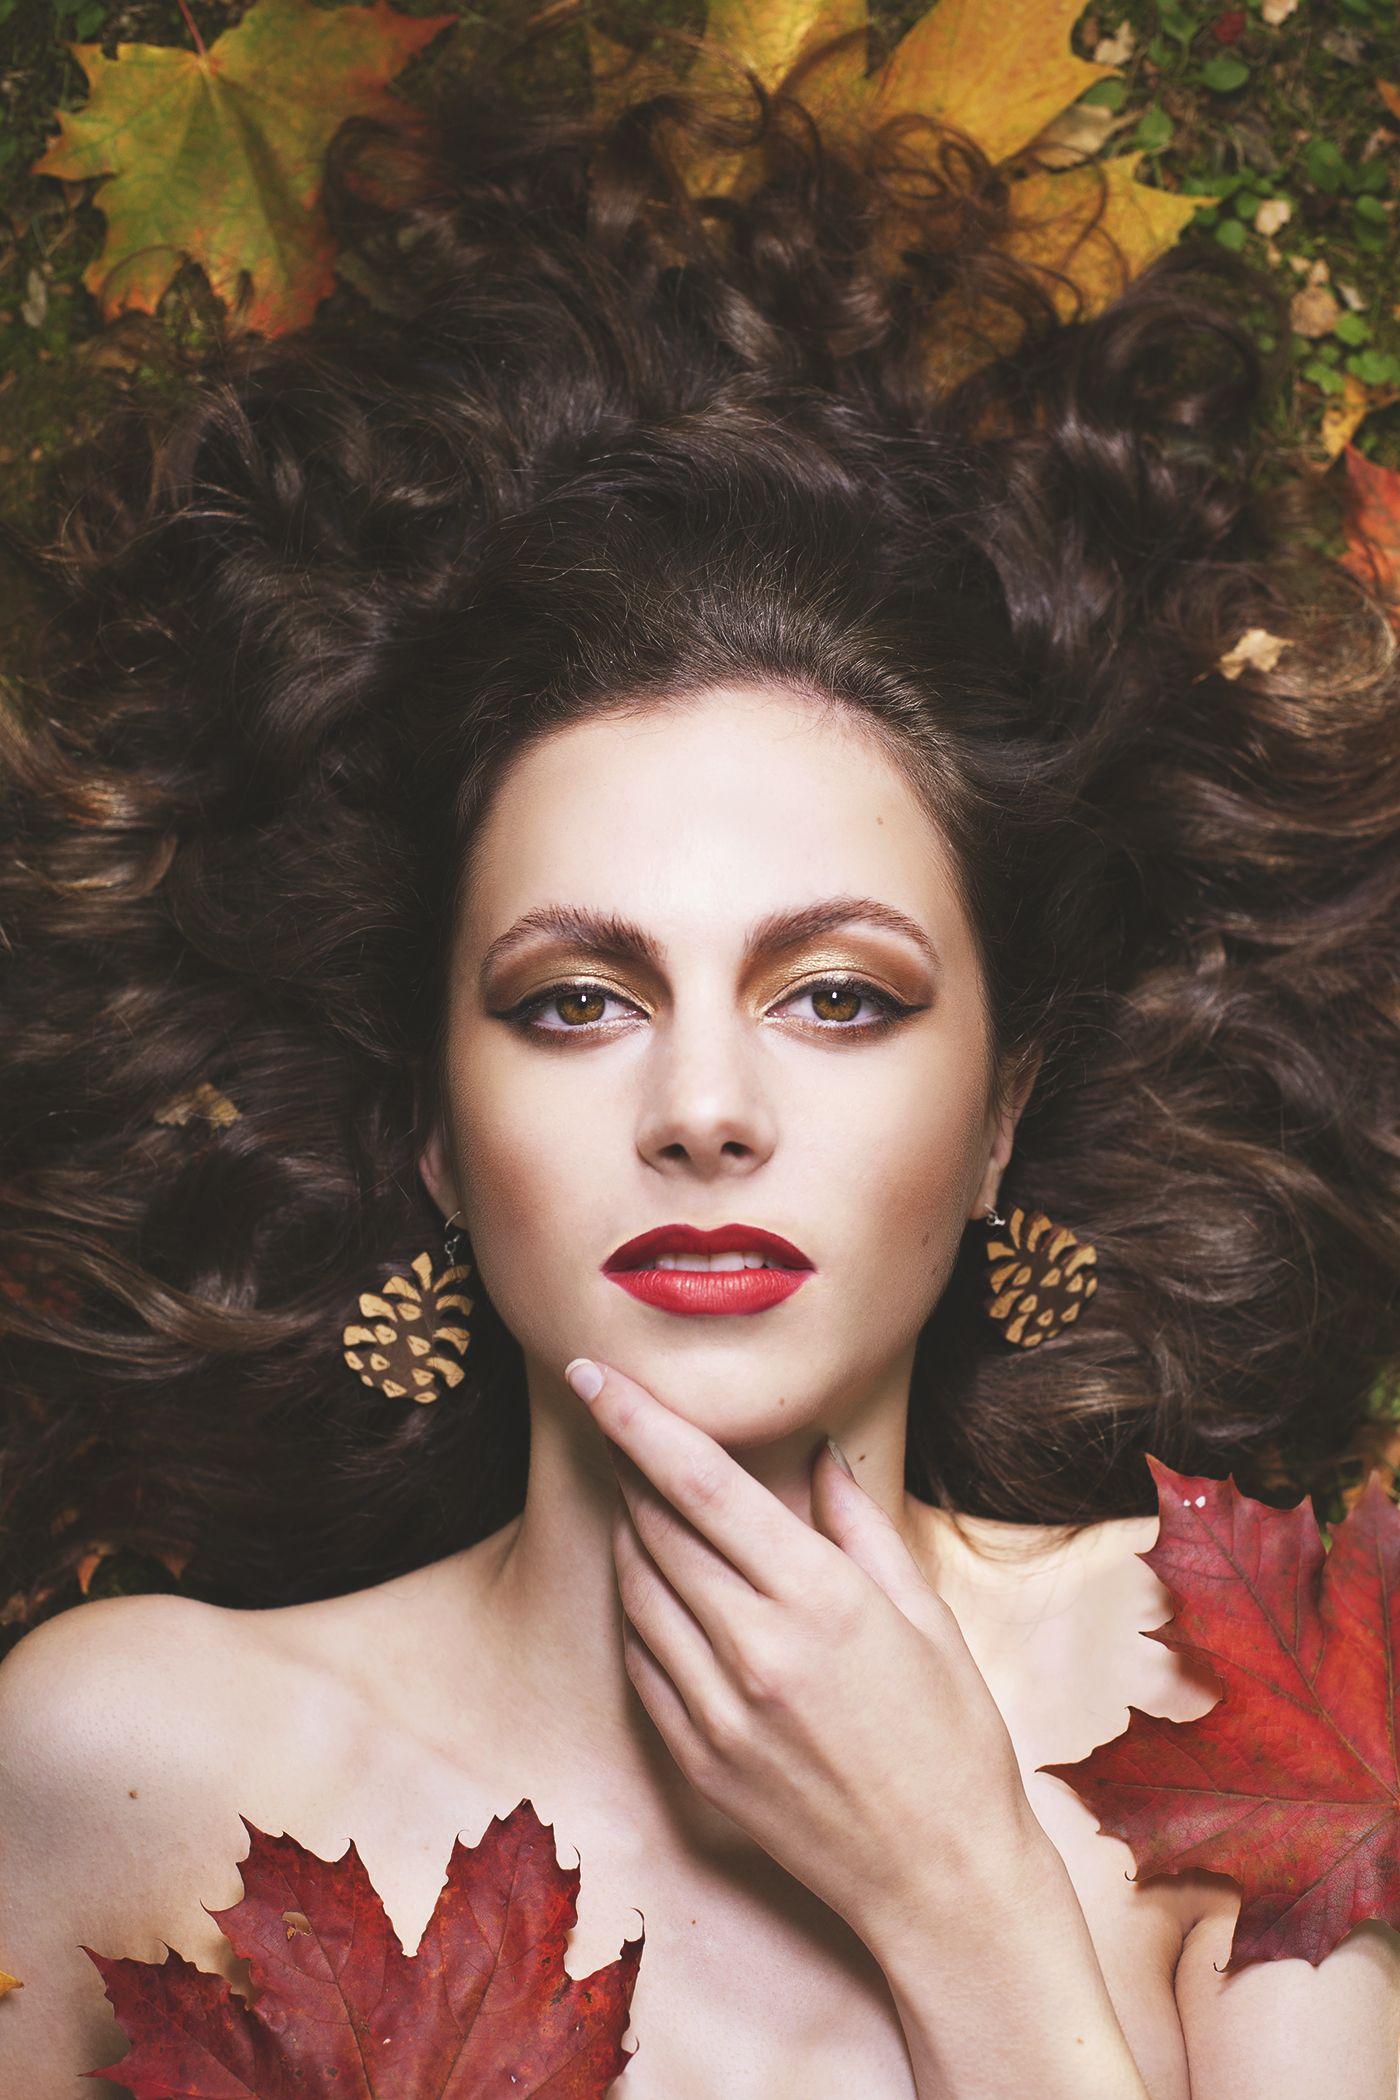 Photo: Lupine photoart, Muah: Studio susu, Model: Heidijanika, Fashion Editor: Maiju Markkanen